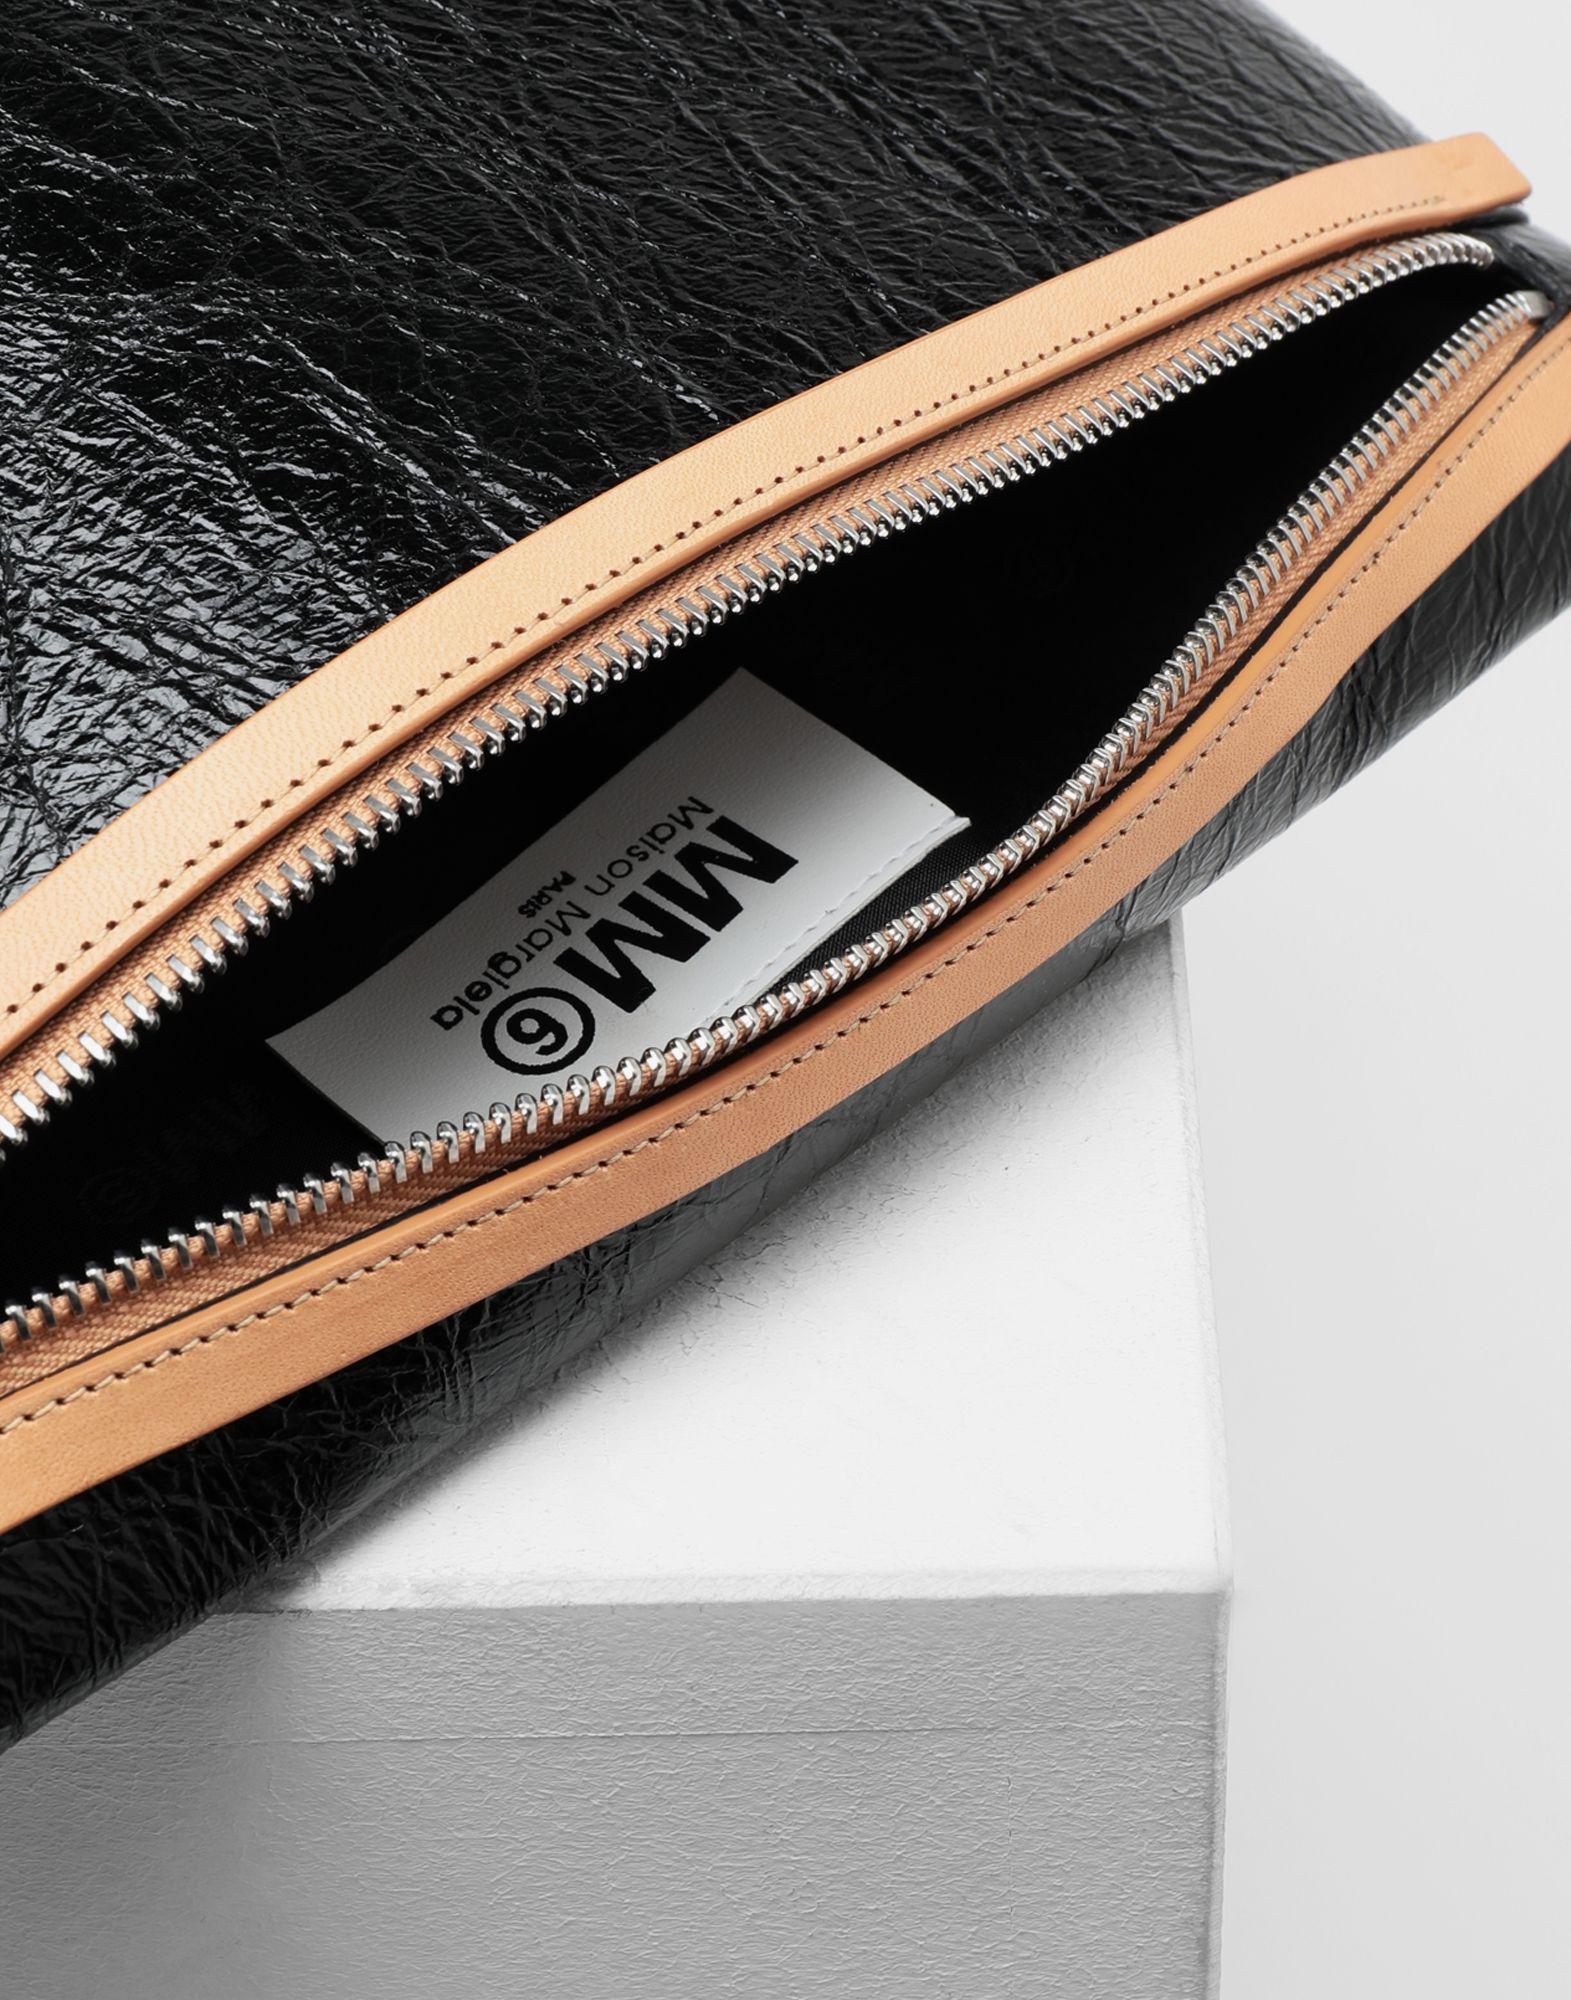 MM6 MAISON MARGIELA Crinkled leather zip pochette Wallet Woman e